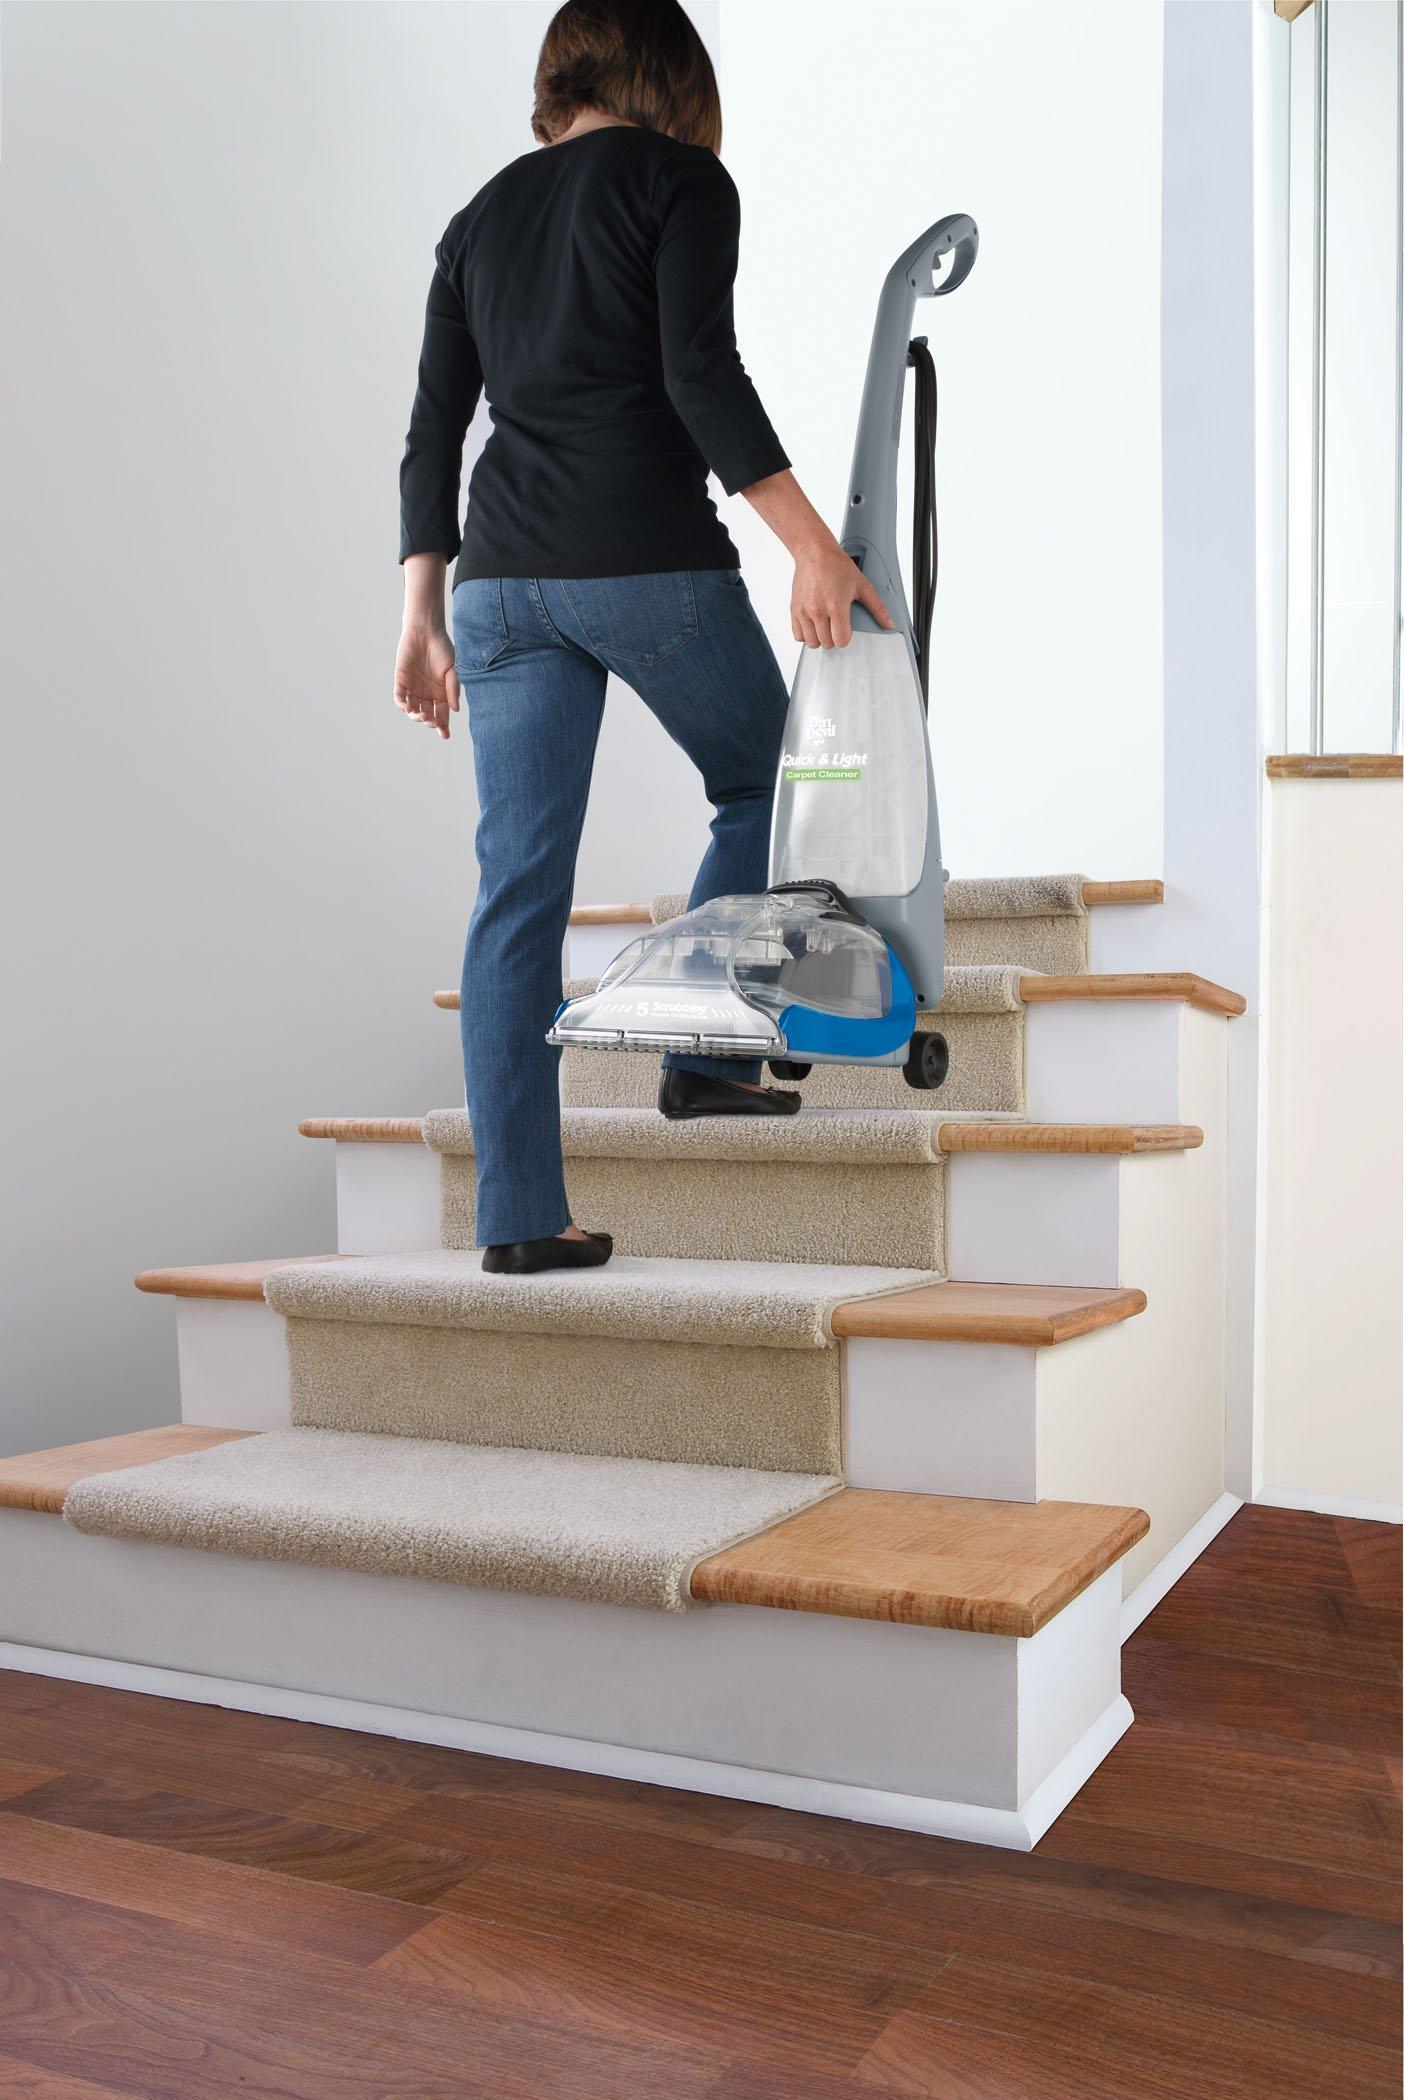 Quick & Light™ Carpet Washer5